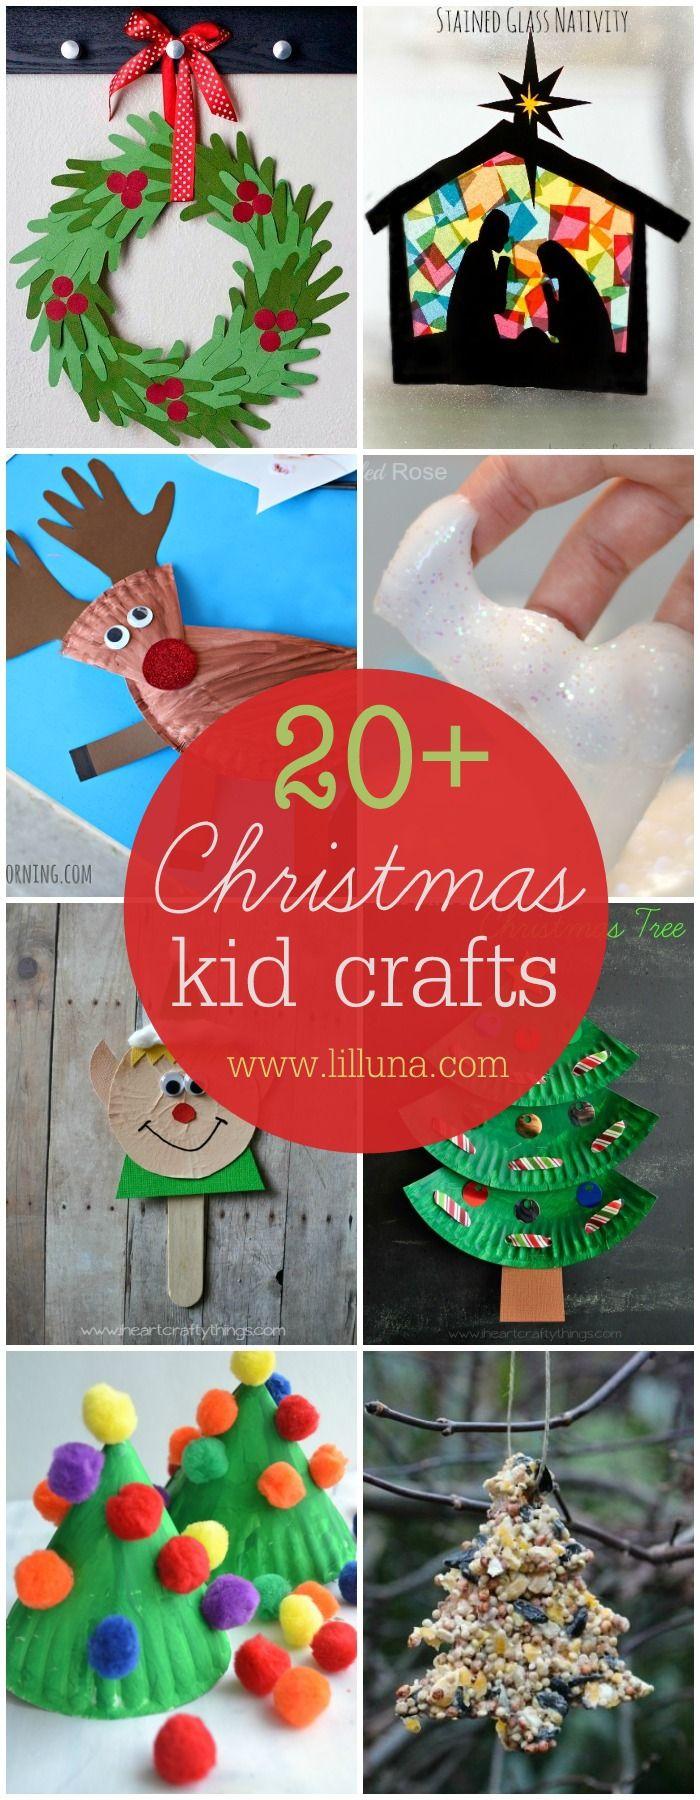 Christmas-Kid-Crafts-2015.jpg (700×1800)